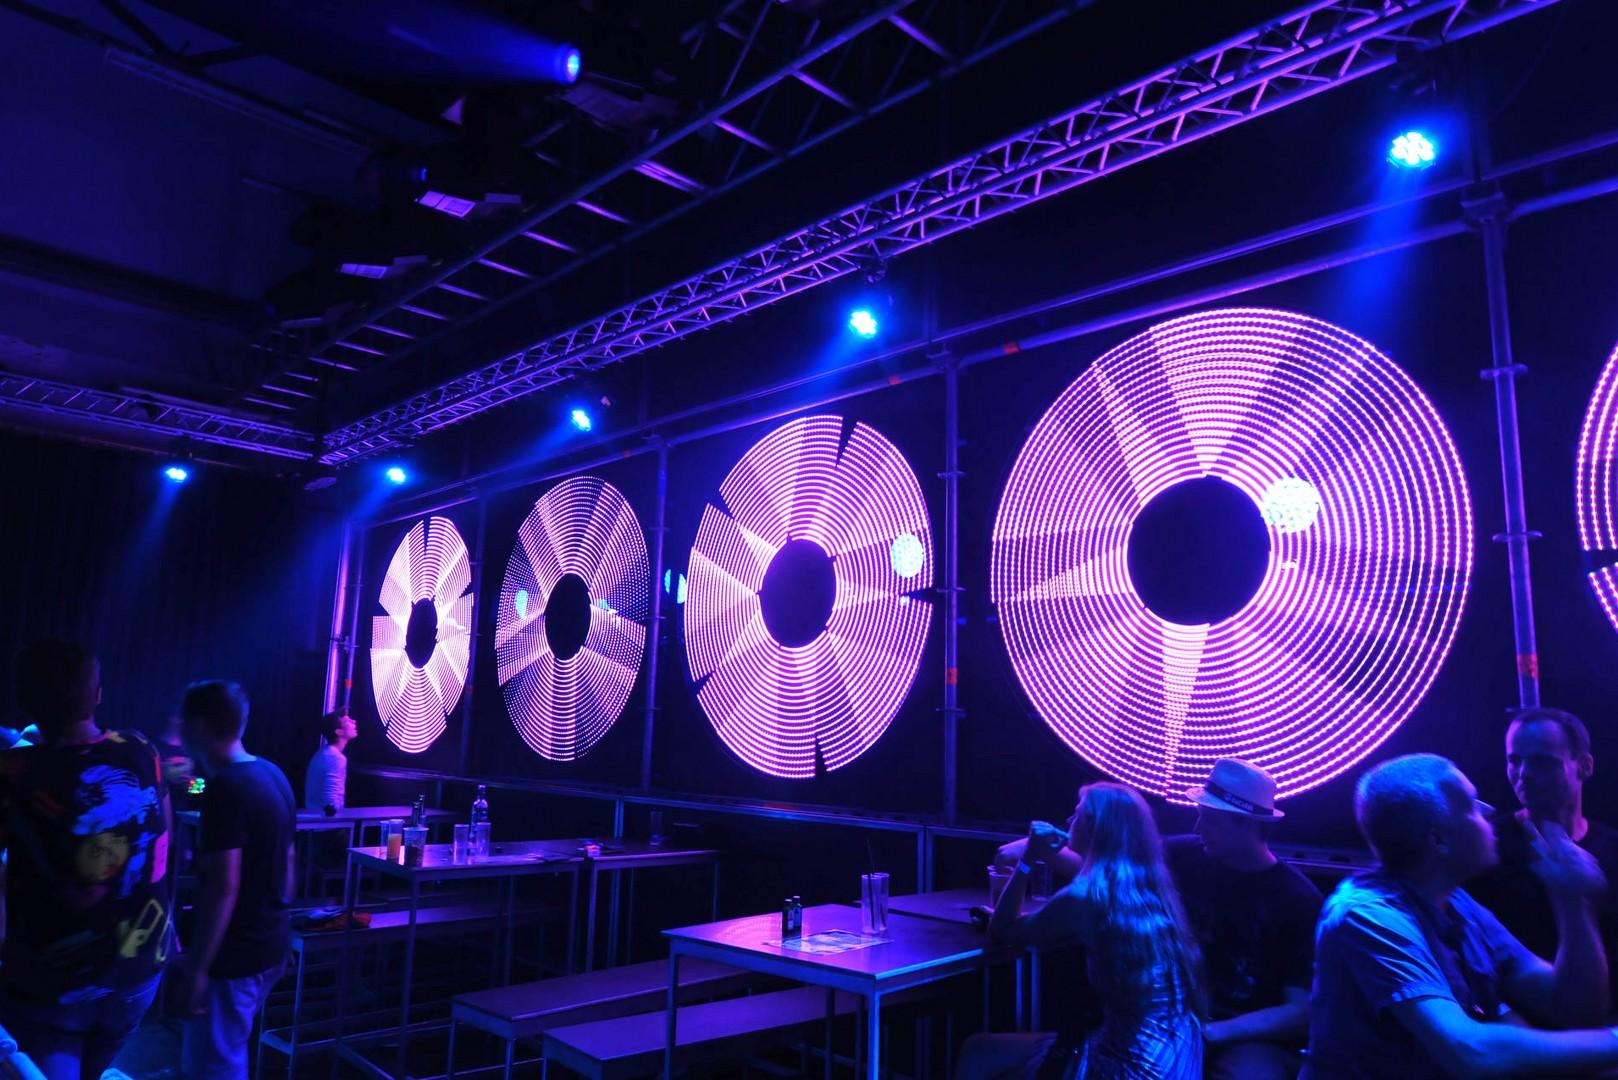 20150829 IbizaDanubePirates 1 -  - Feelon Media&Entertainment - Event & Werbeagentur